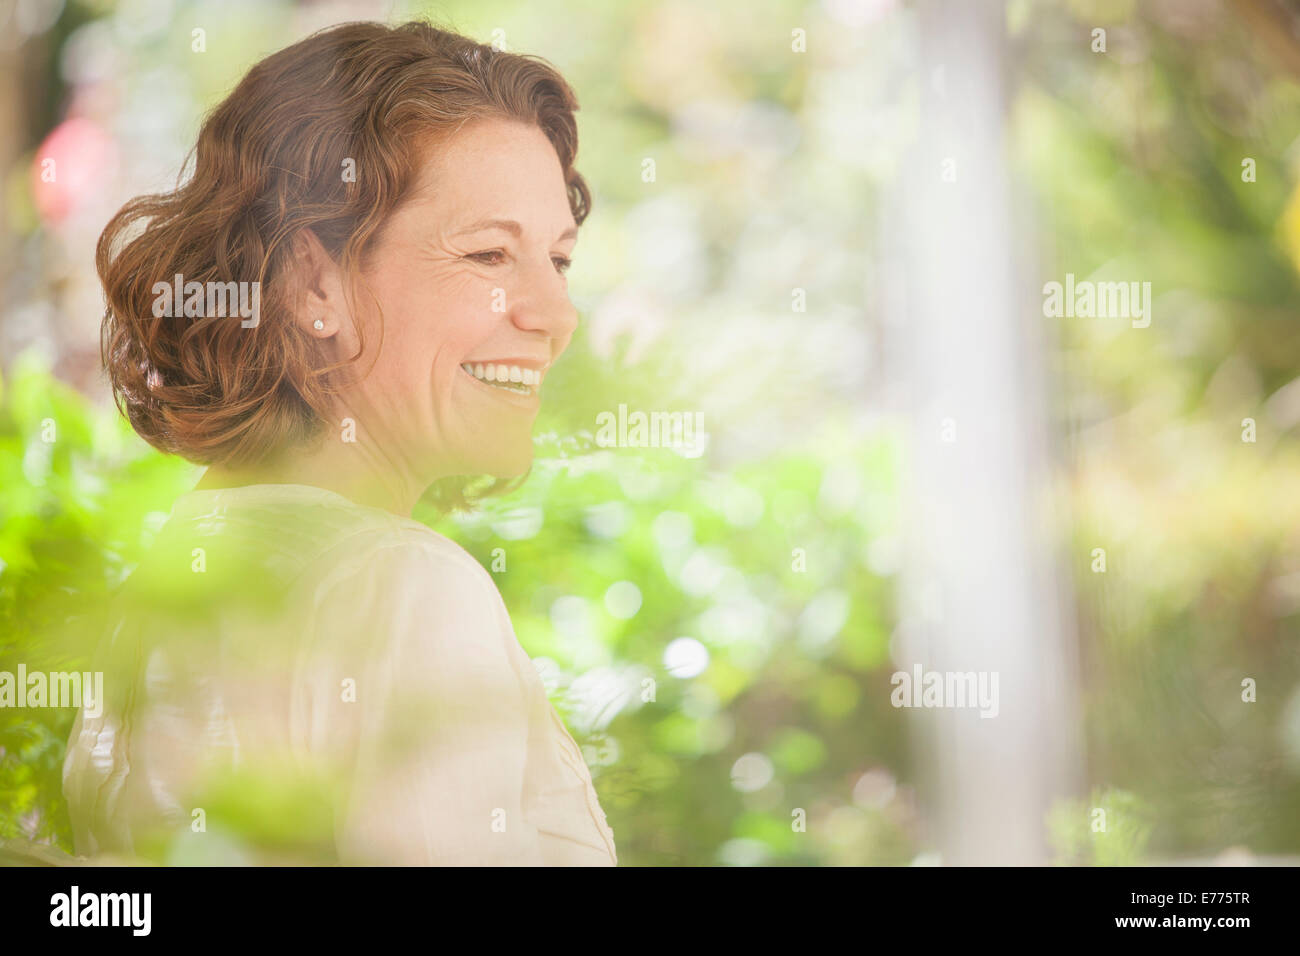 older women outdoors